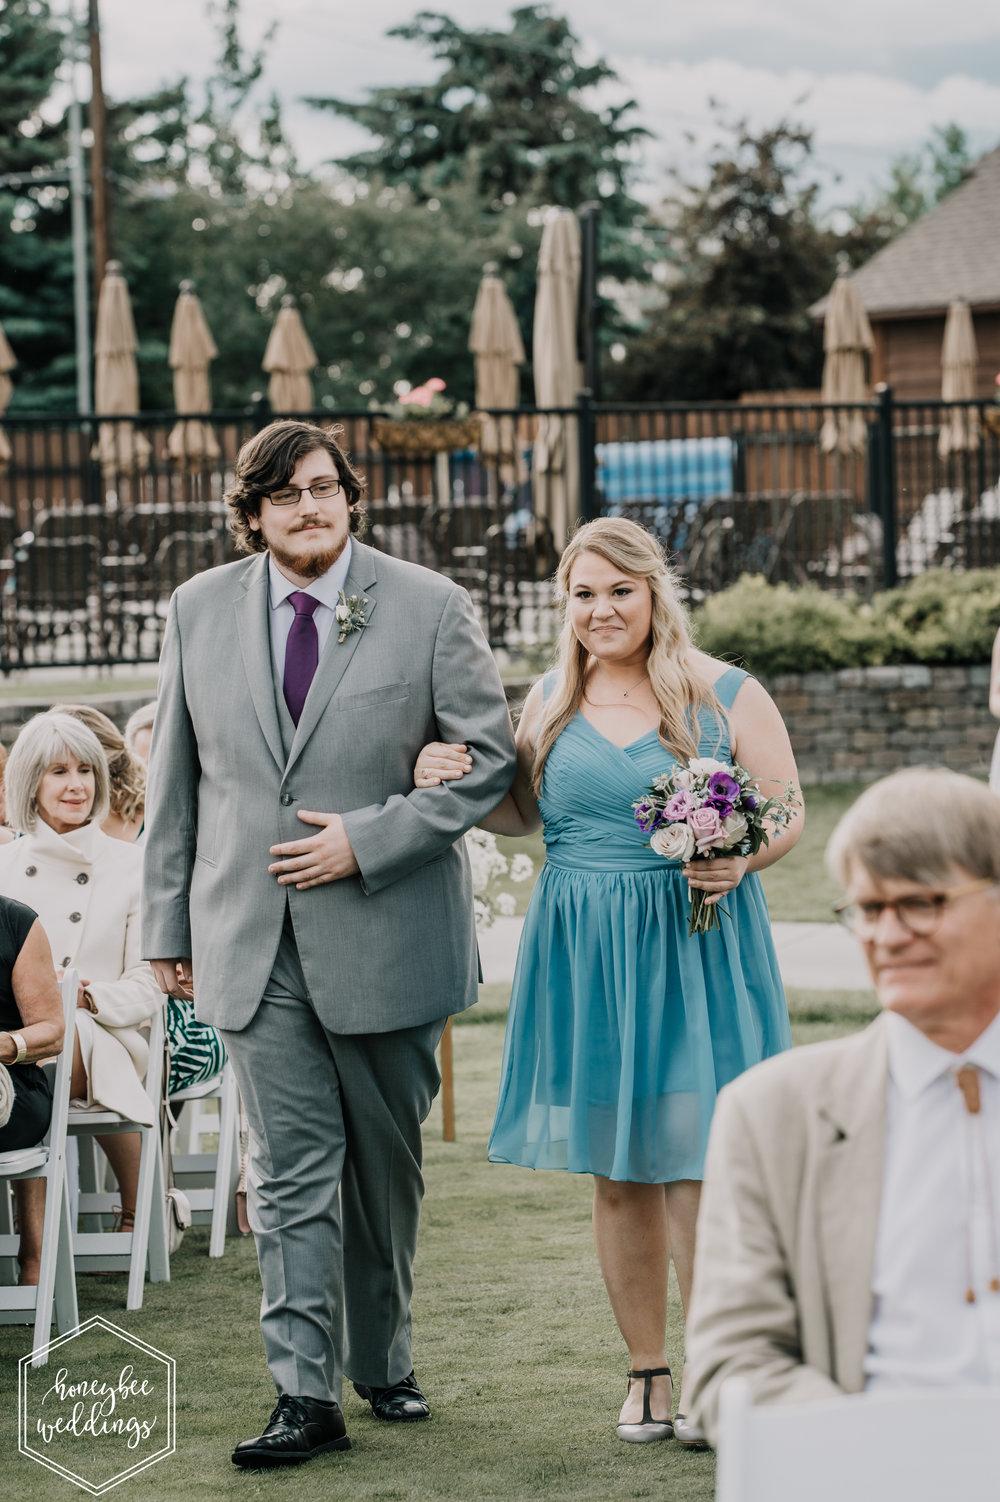 550 Riverside Country Club Wedding_Montana Wedding Photographer_Lauren Jackson + Evan Ivaldi 2018-6579.jpg